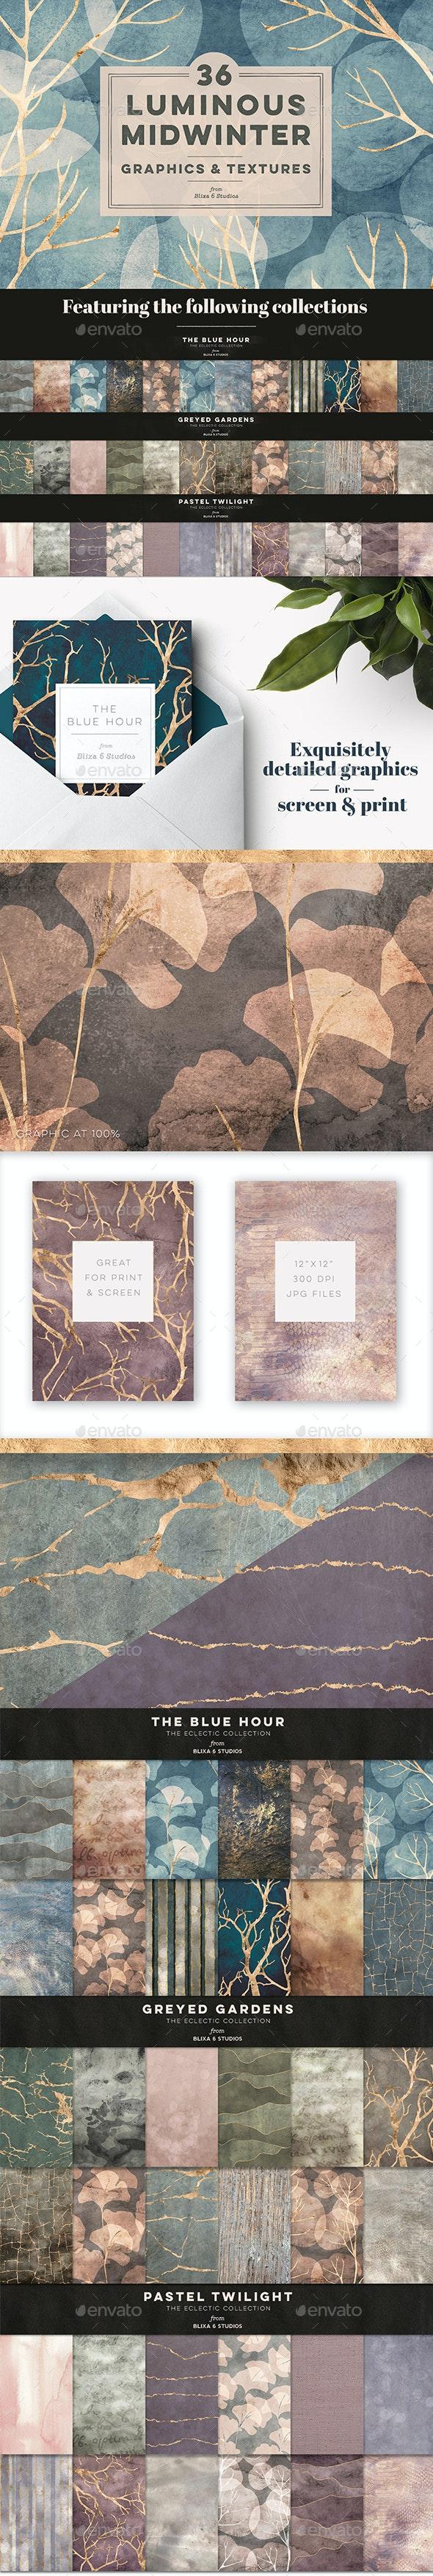 36 Luminous Midwinter Graphics & Textures - Nature Backgrounds